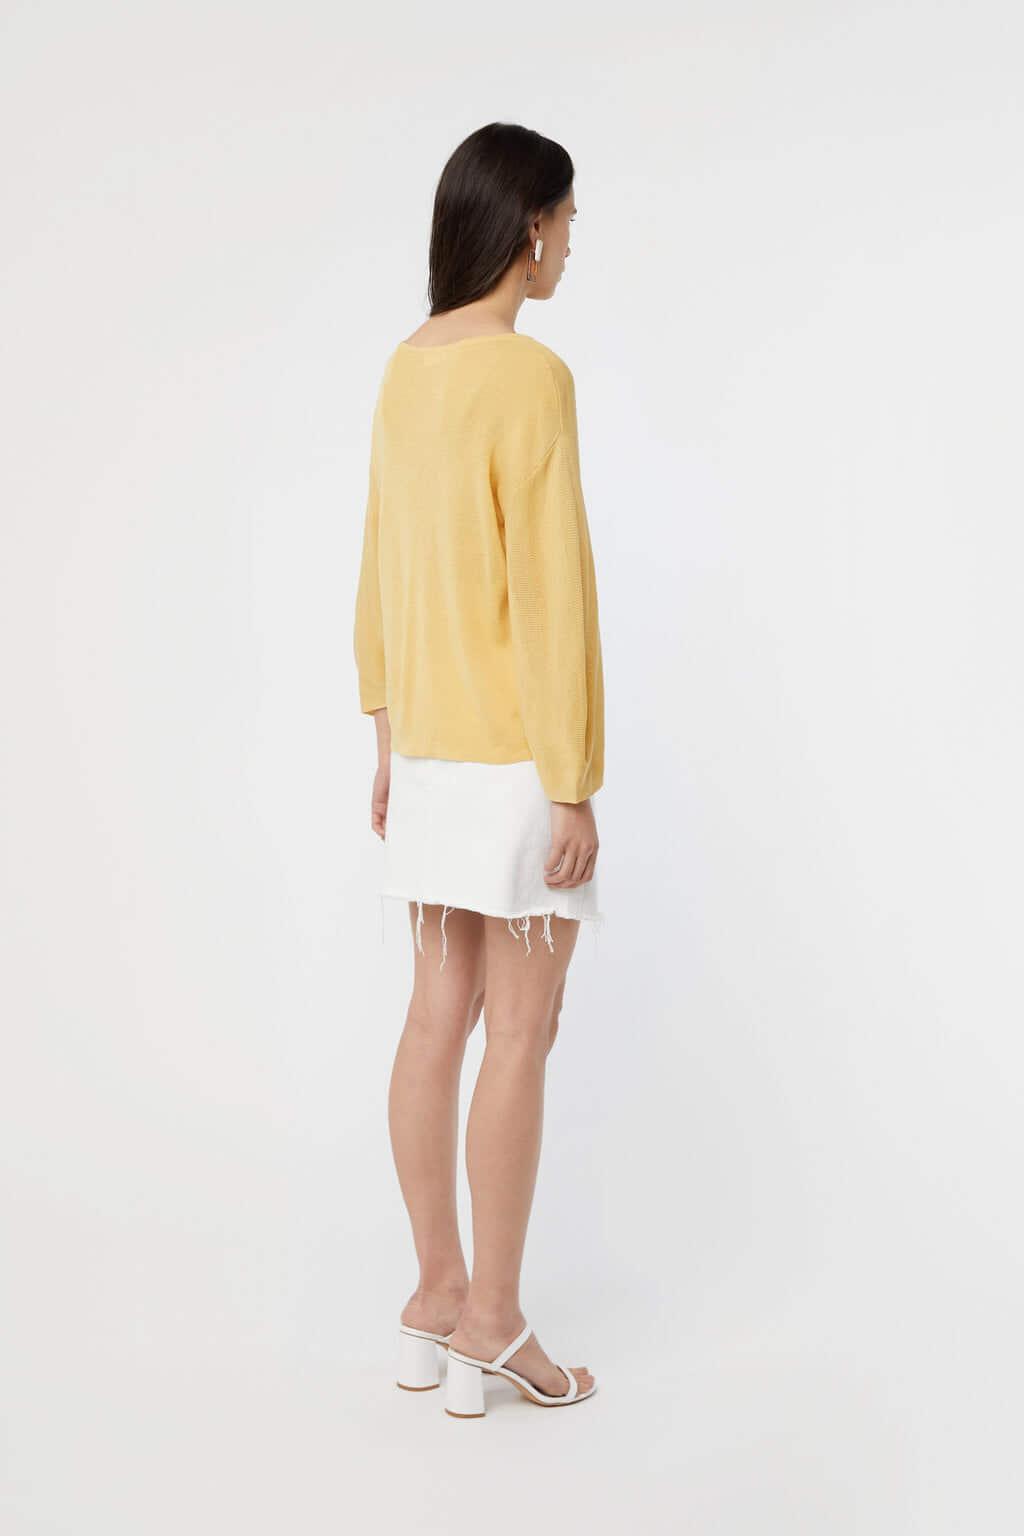 TShirt K010 Yellow 5